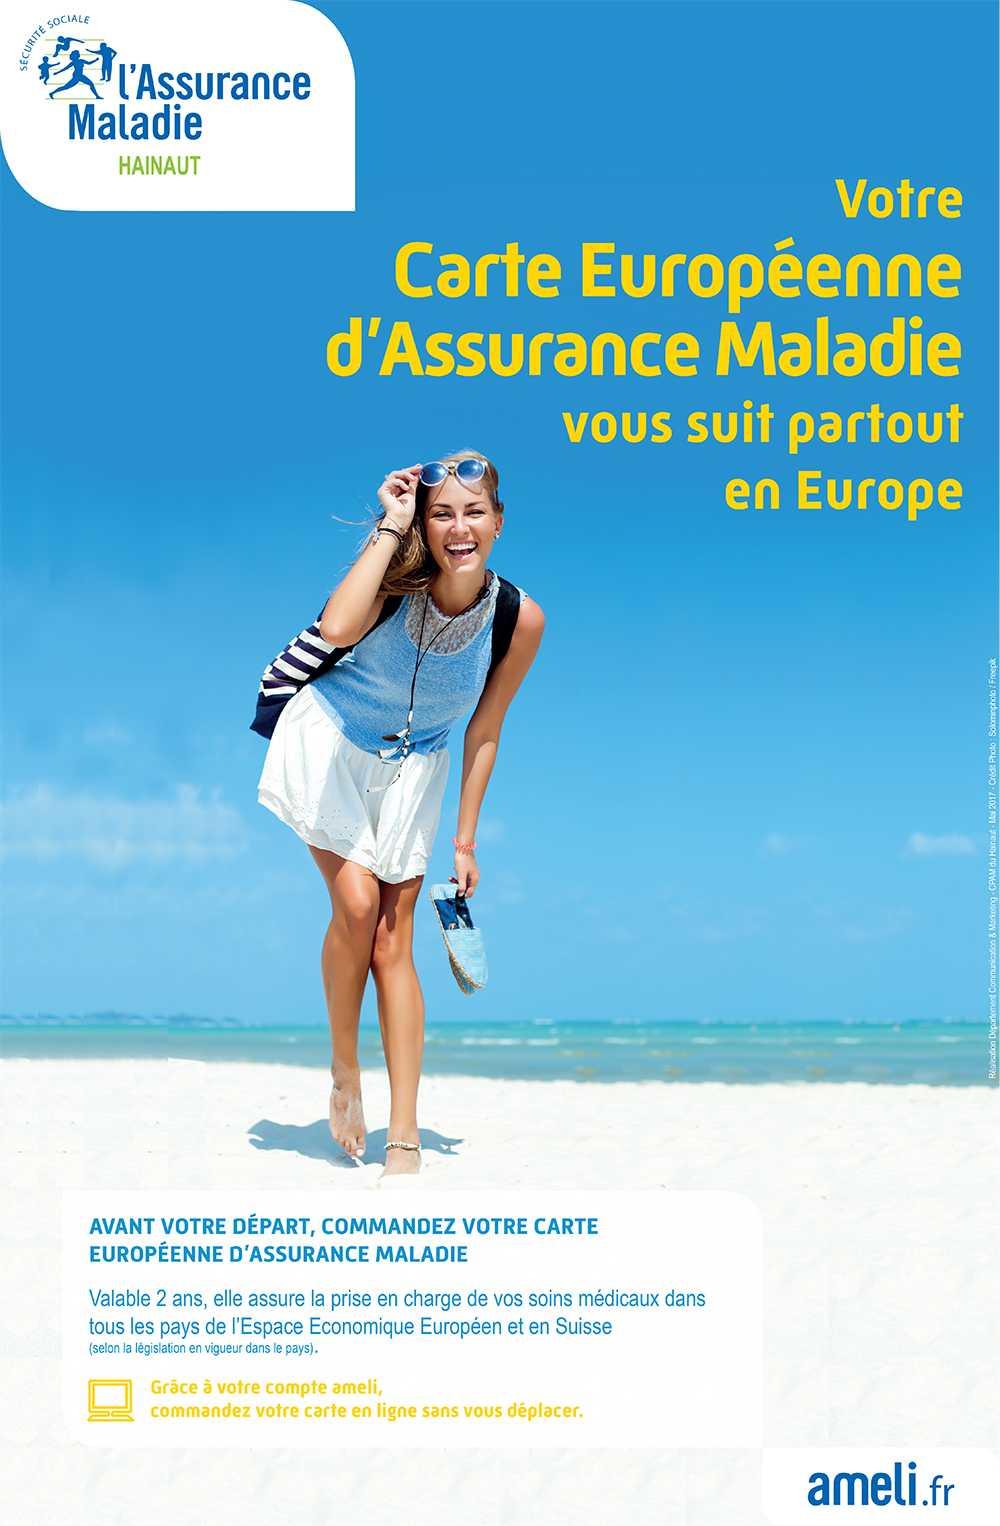 Carte Europeenne Assurance Maladie Ameli.La Carte Europeenne D Assurance Maladie Ville De Fourmies